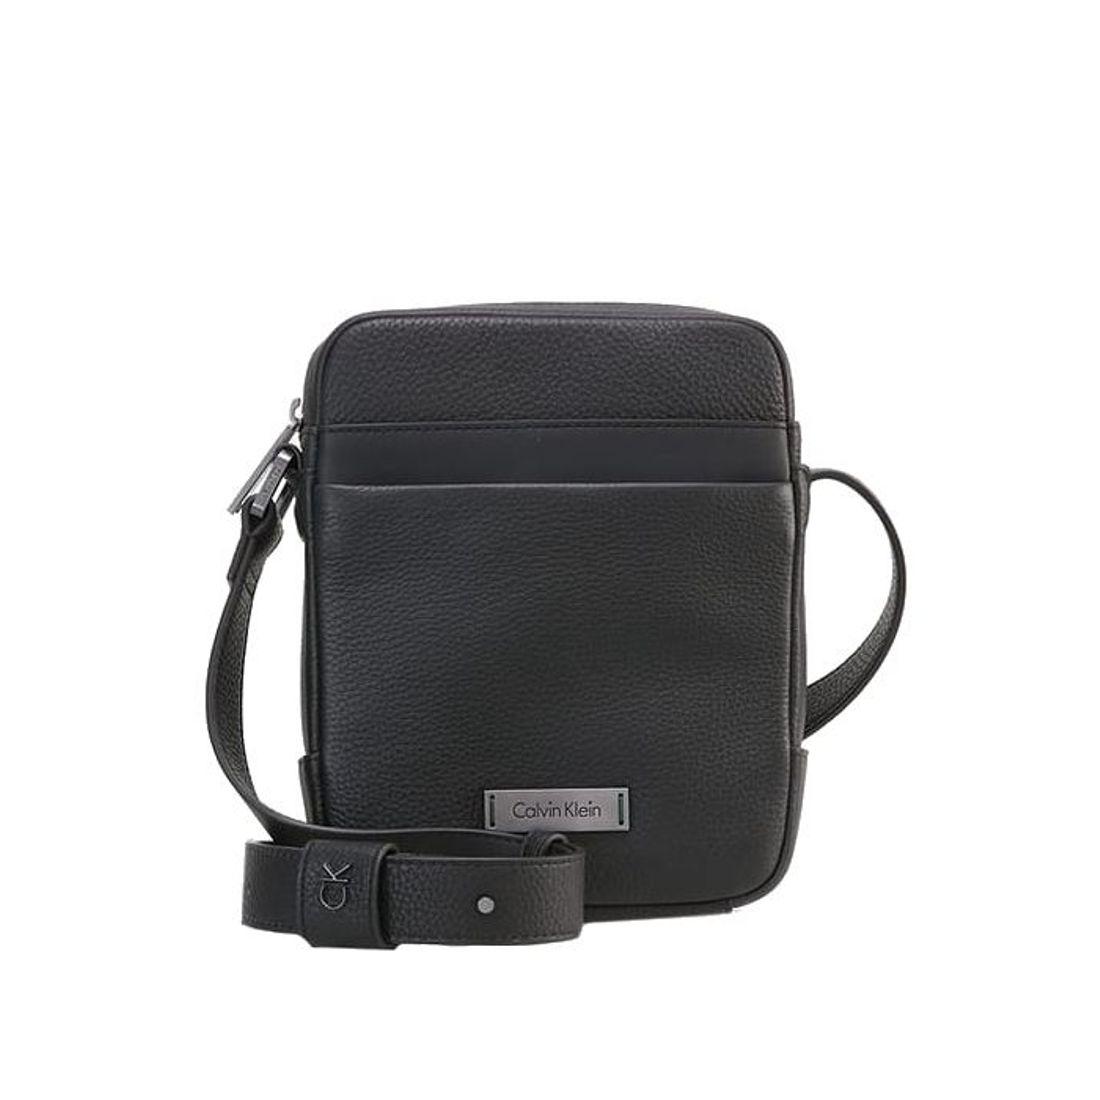 6d162d4092cf1a CALVIN KLEIN Mini Reporter Essential K50K502303 Nero - Bagsabout